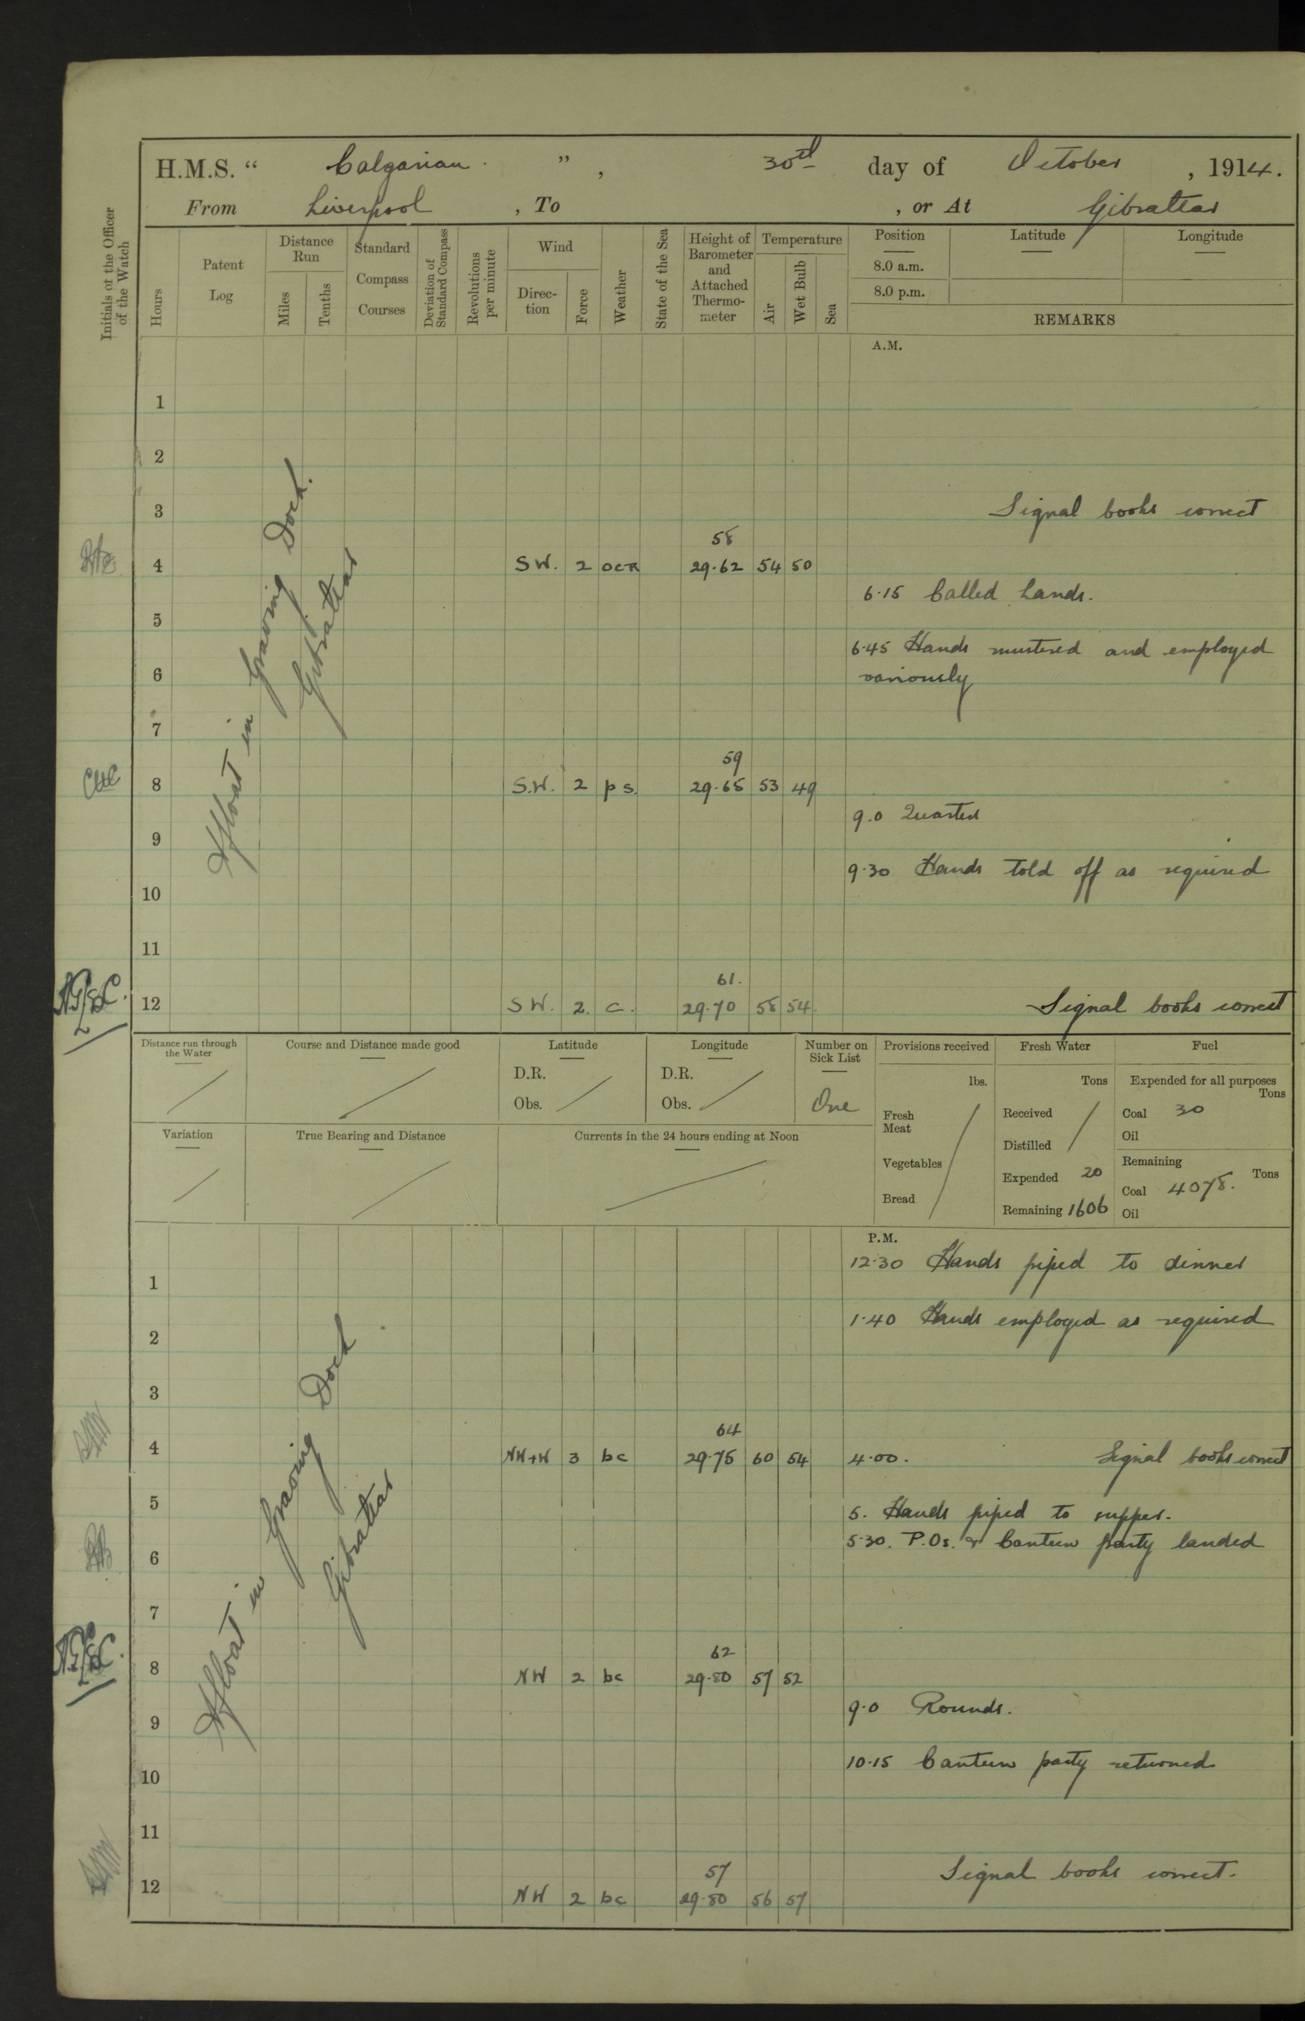 Hms Calgarian Armed Merchant Cruiser British Warships Of World War 1 1949 Plymouth Wiring Diagram 4caf84e3cadfd3419700af37 Http Oldweathers3amazonawscom Adm53 36639 Adm 53 018 0